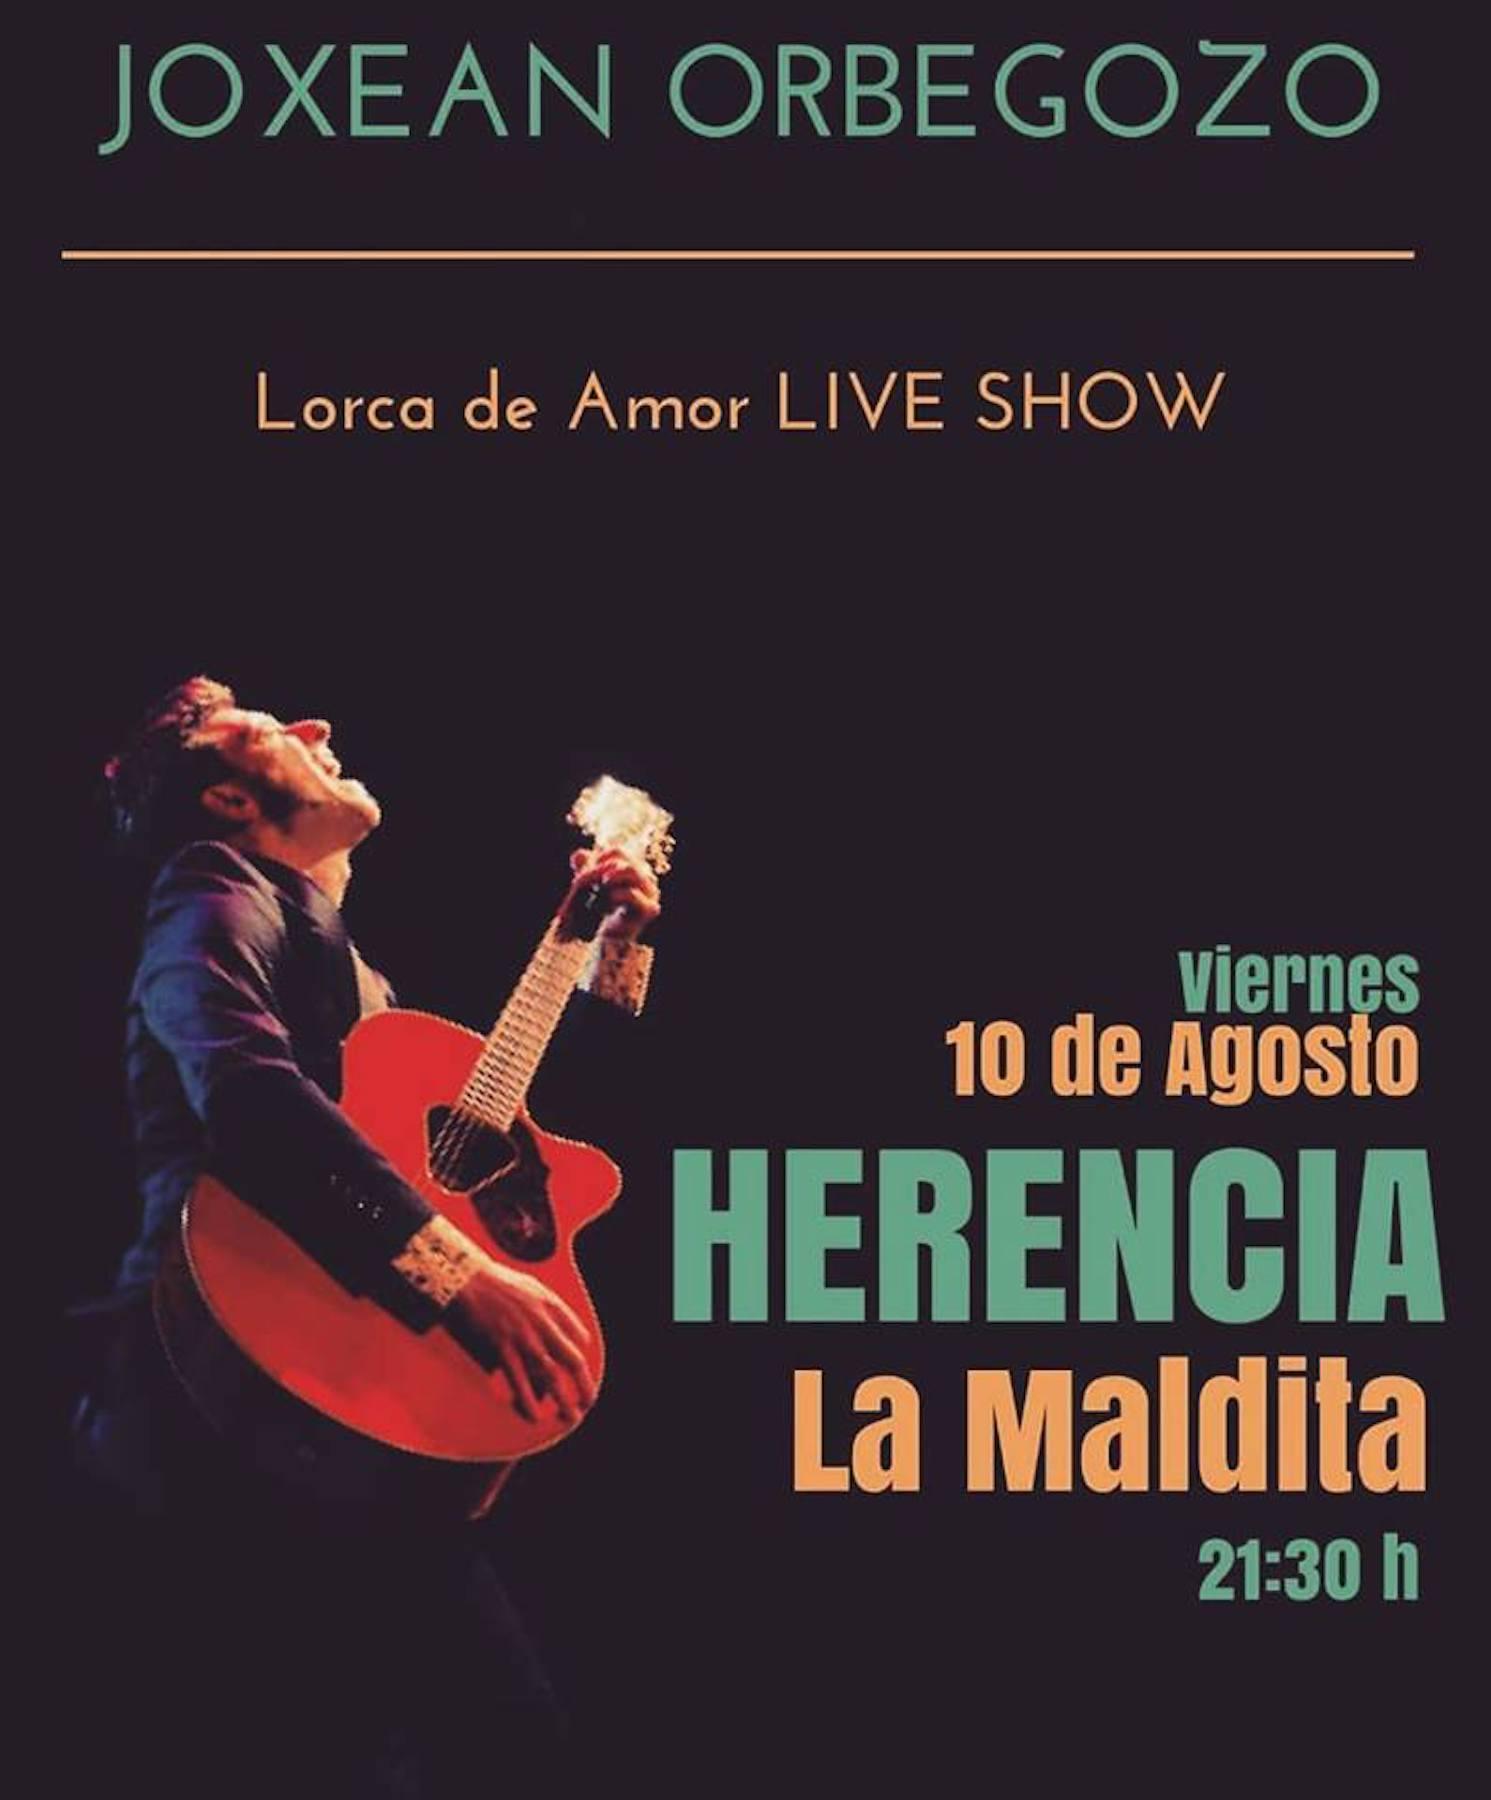 "joxean orbegozo lorca de amor - Joxean Orbegozo trae su show ""Lorca de Amor"" a Herencia"